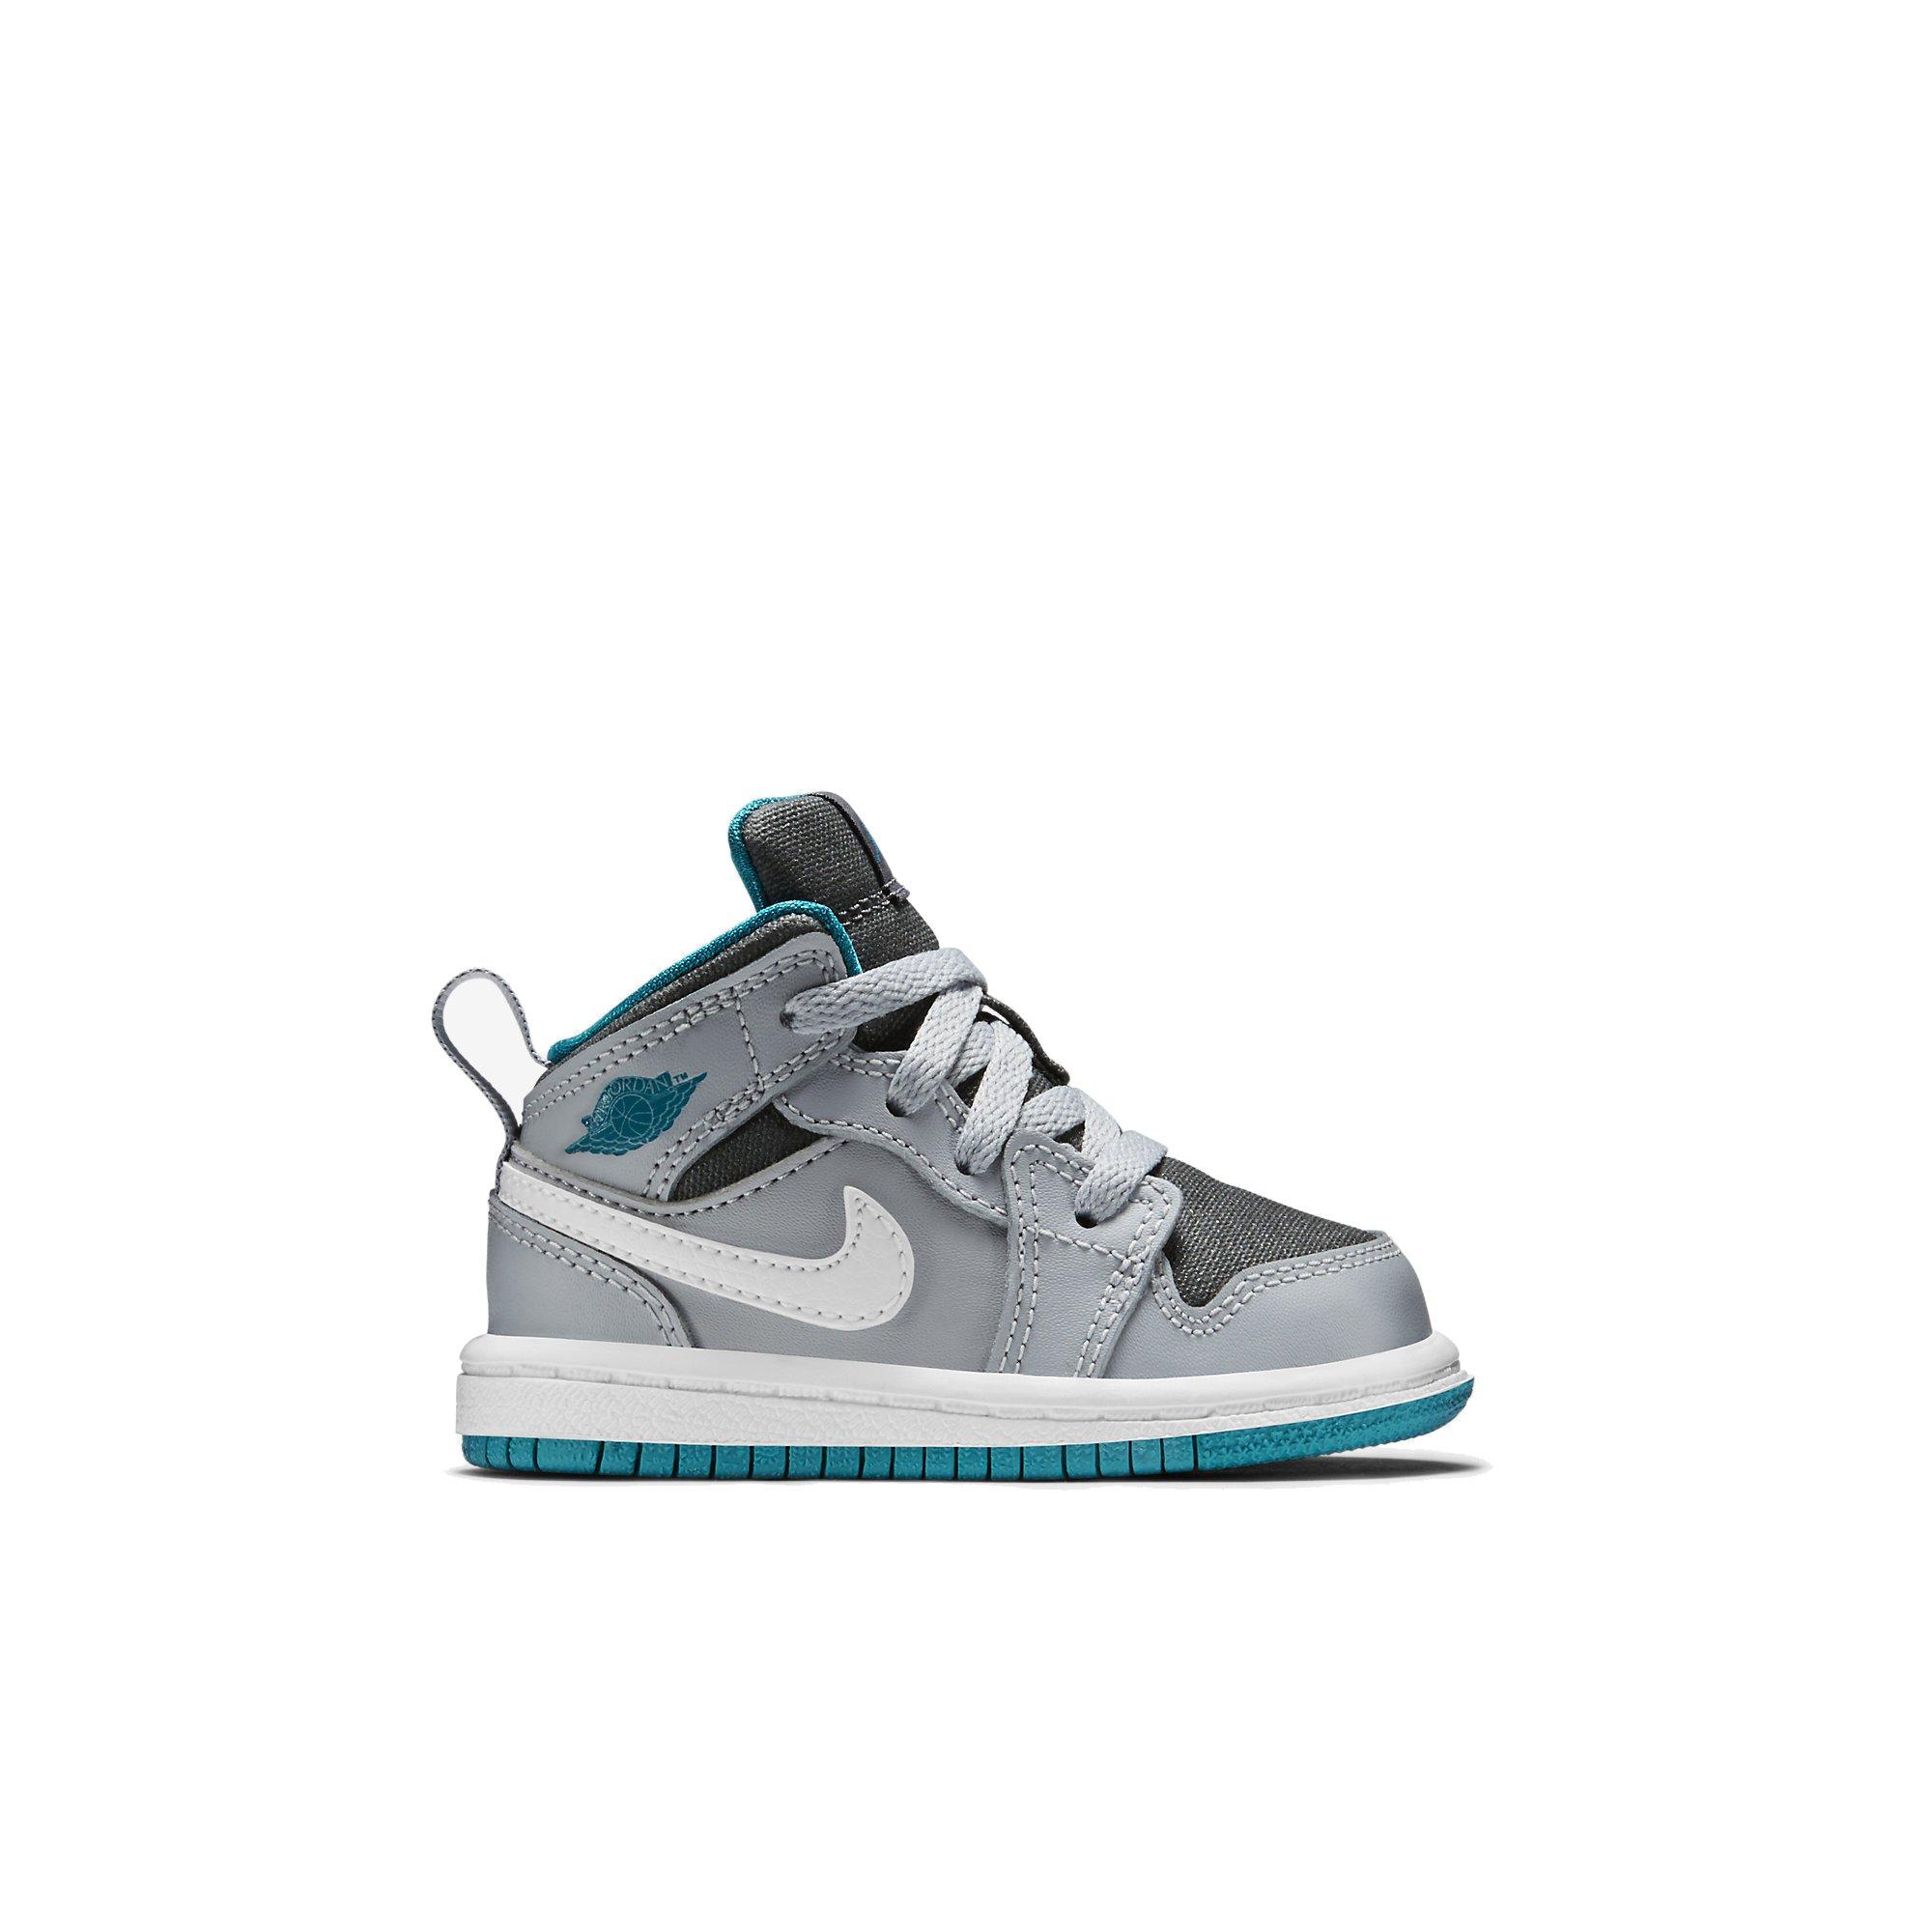 wholesale dealer 47f63 4bb96 Galleon - Jordan 1 Mid BT Toddlers Sneakers 640735-027